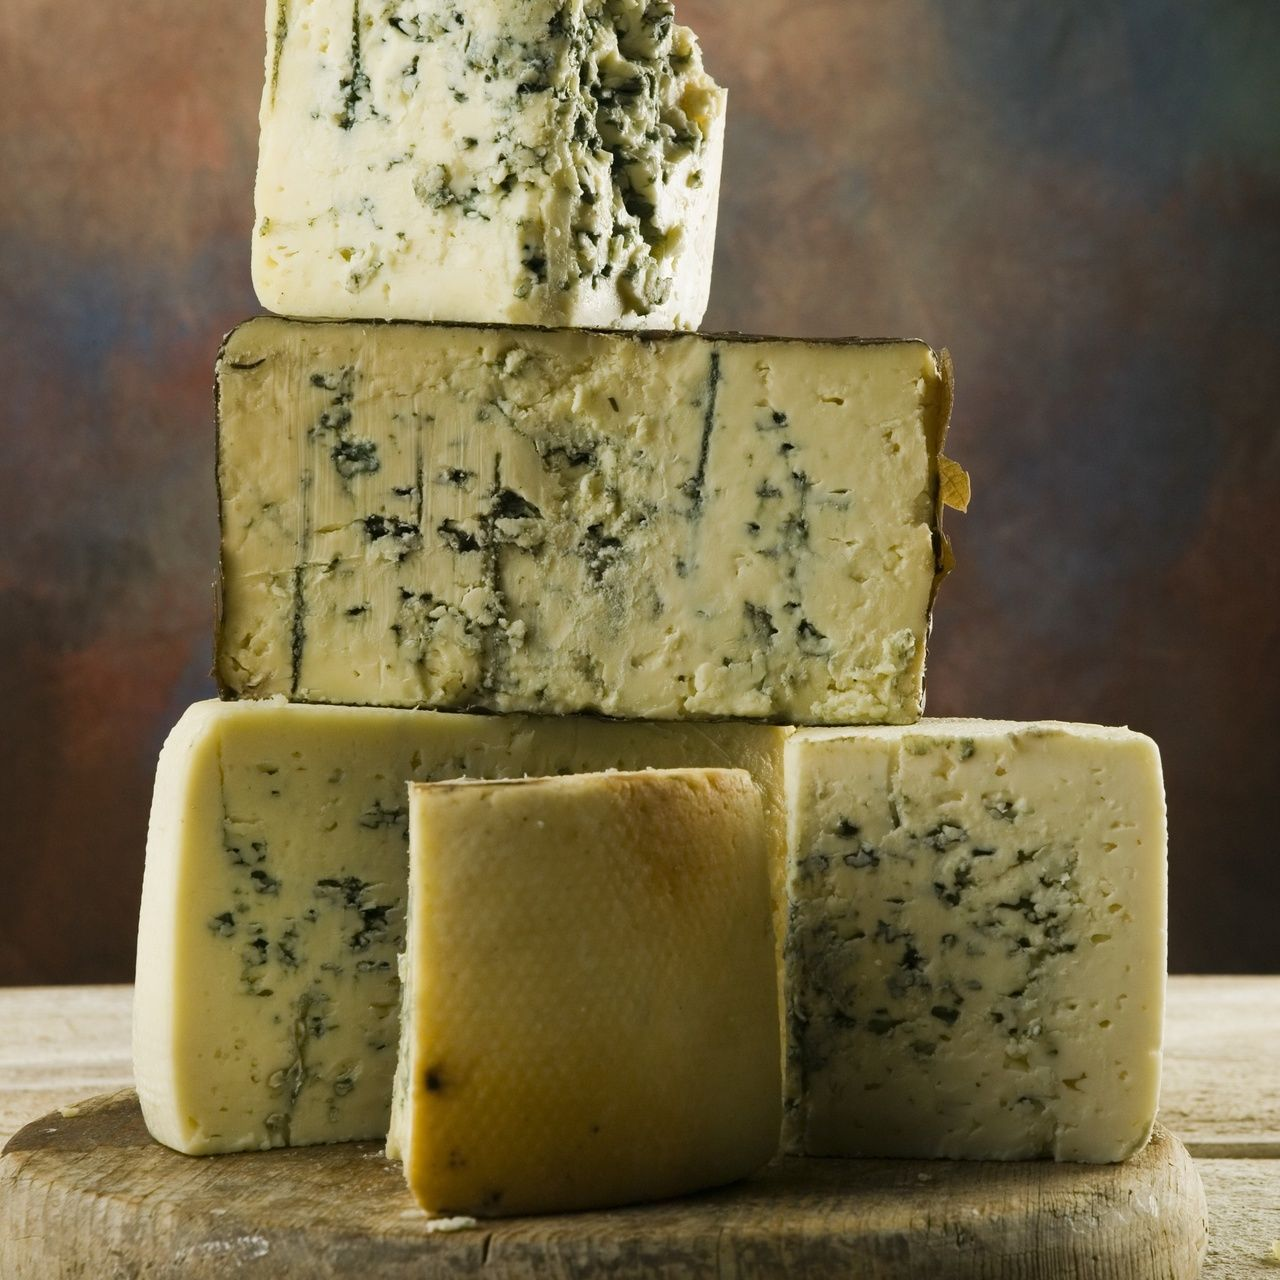 Rogue creamery award winning blue cheeses gbve0q